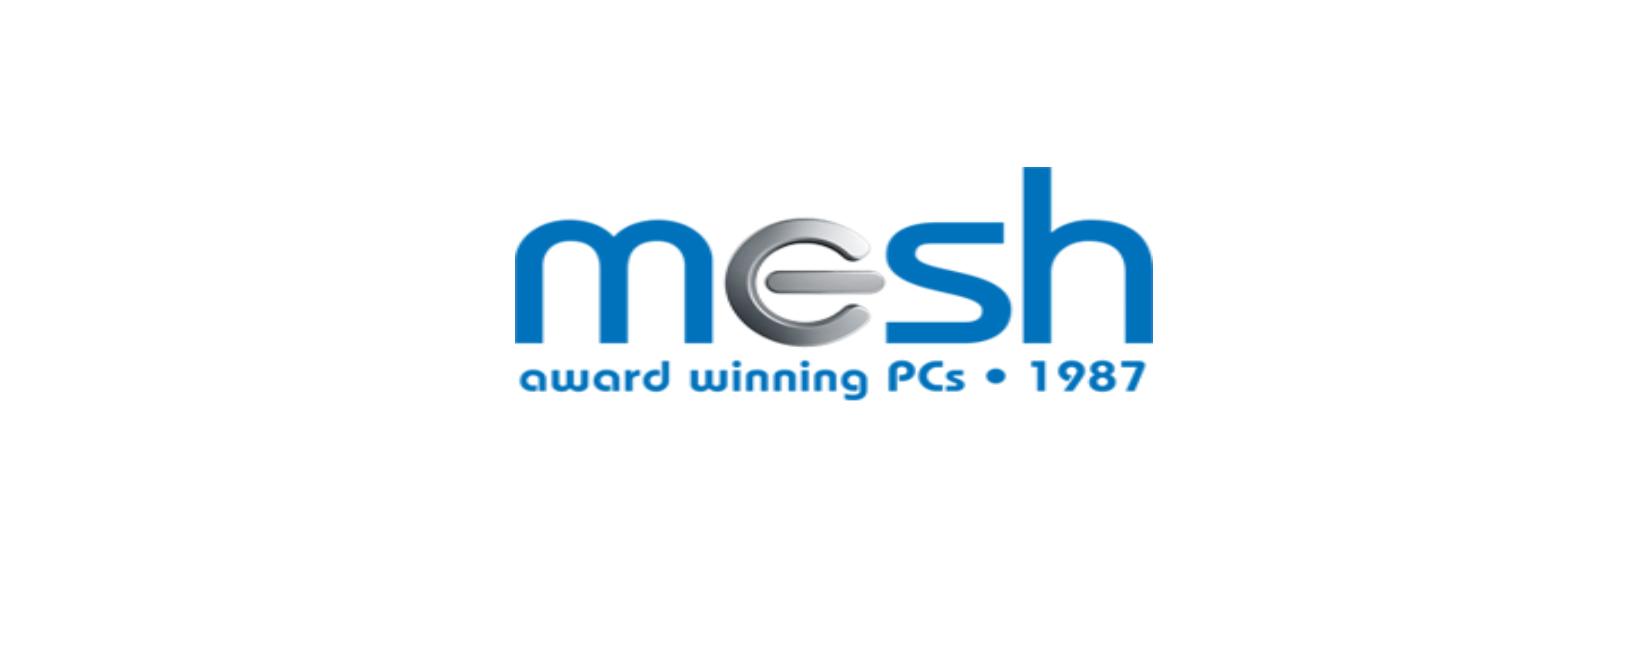 mesh UK Discount Code 2021